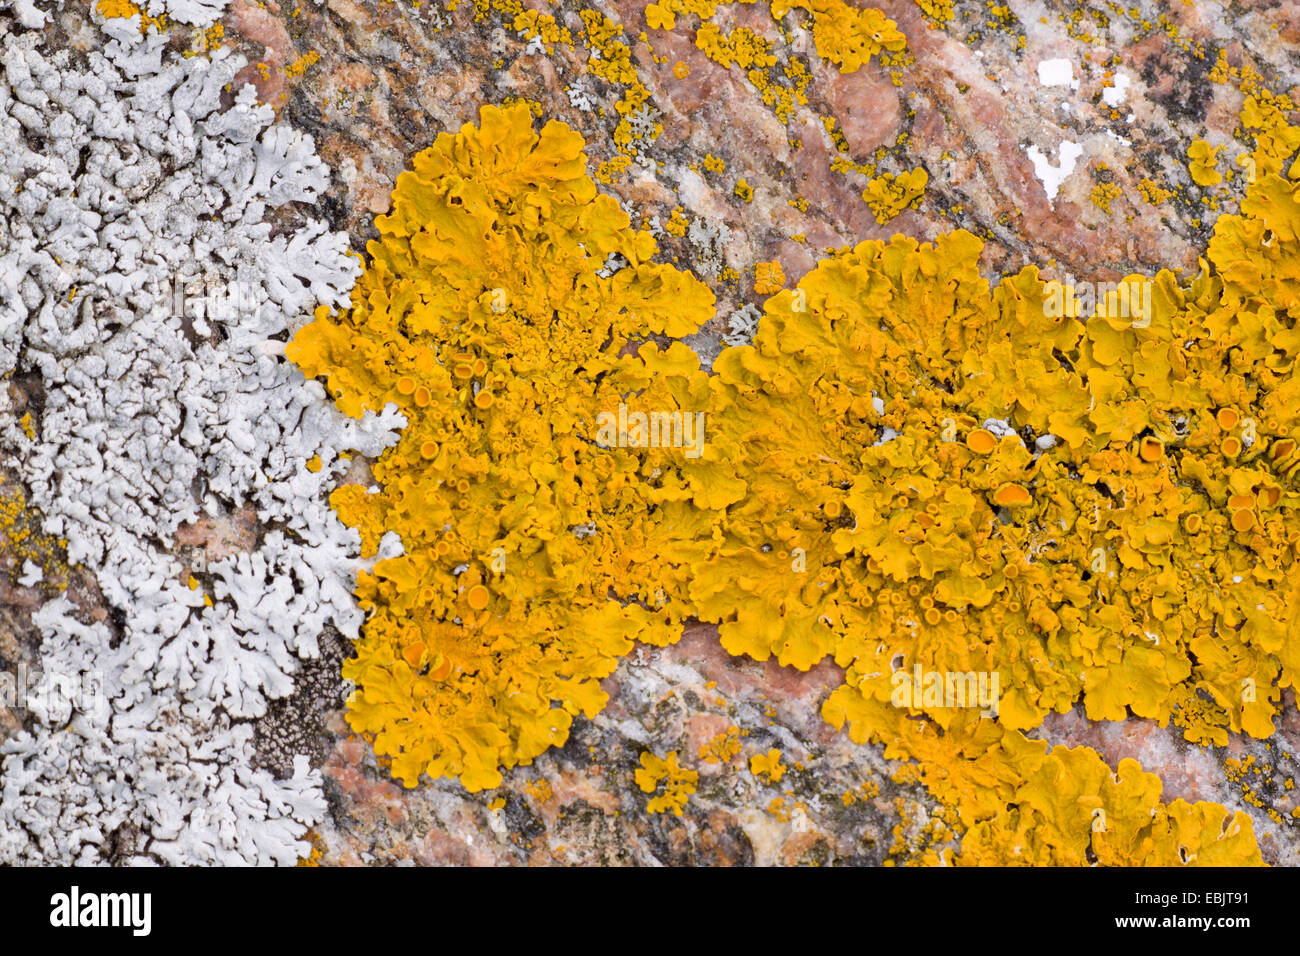 Common orange lichen, Yellow scale, Maritime sunburst lichen, Shore lichen, Golden shield lichen (Xanthoria parietina, - Stock Image